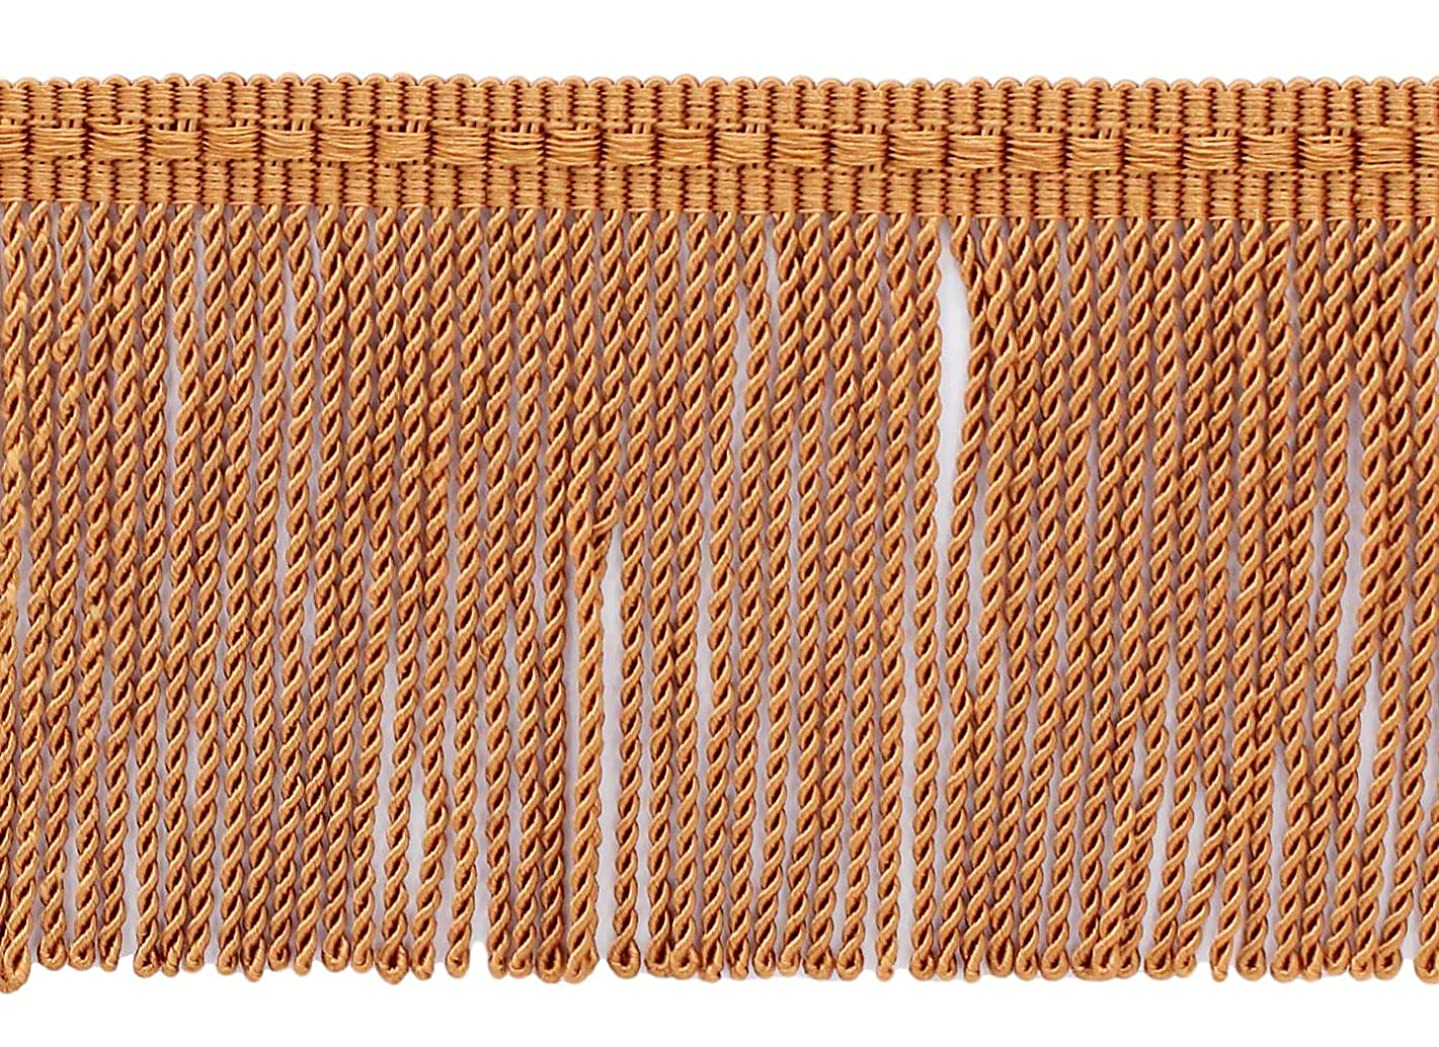 DéCOPRO 24 Yard Package - 3 Inch Long Terra Cotta Thin Bullion Fringe Trim, Style# BFTC3 Color: K50 (72 Ft / 21.9 Meters) gnwmsc5699174